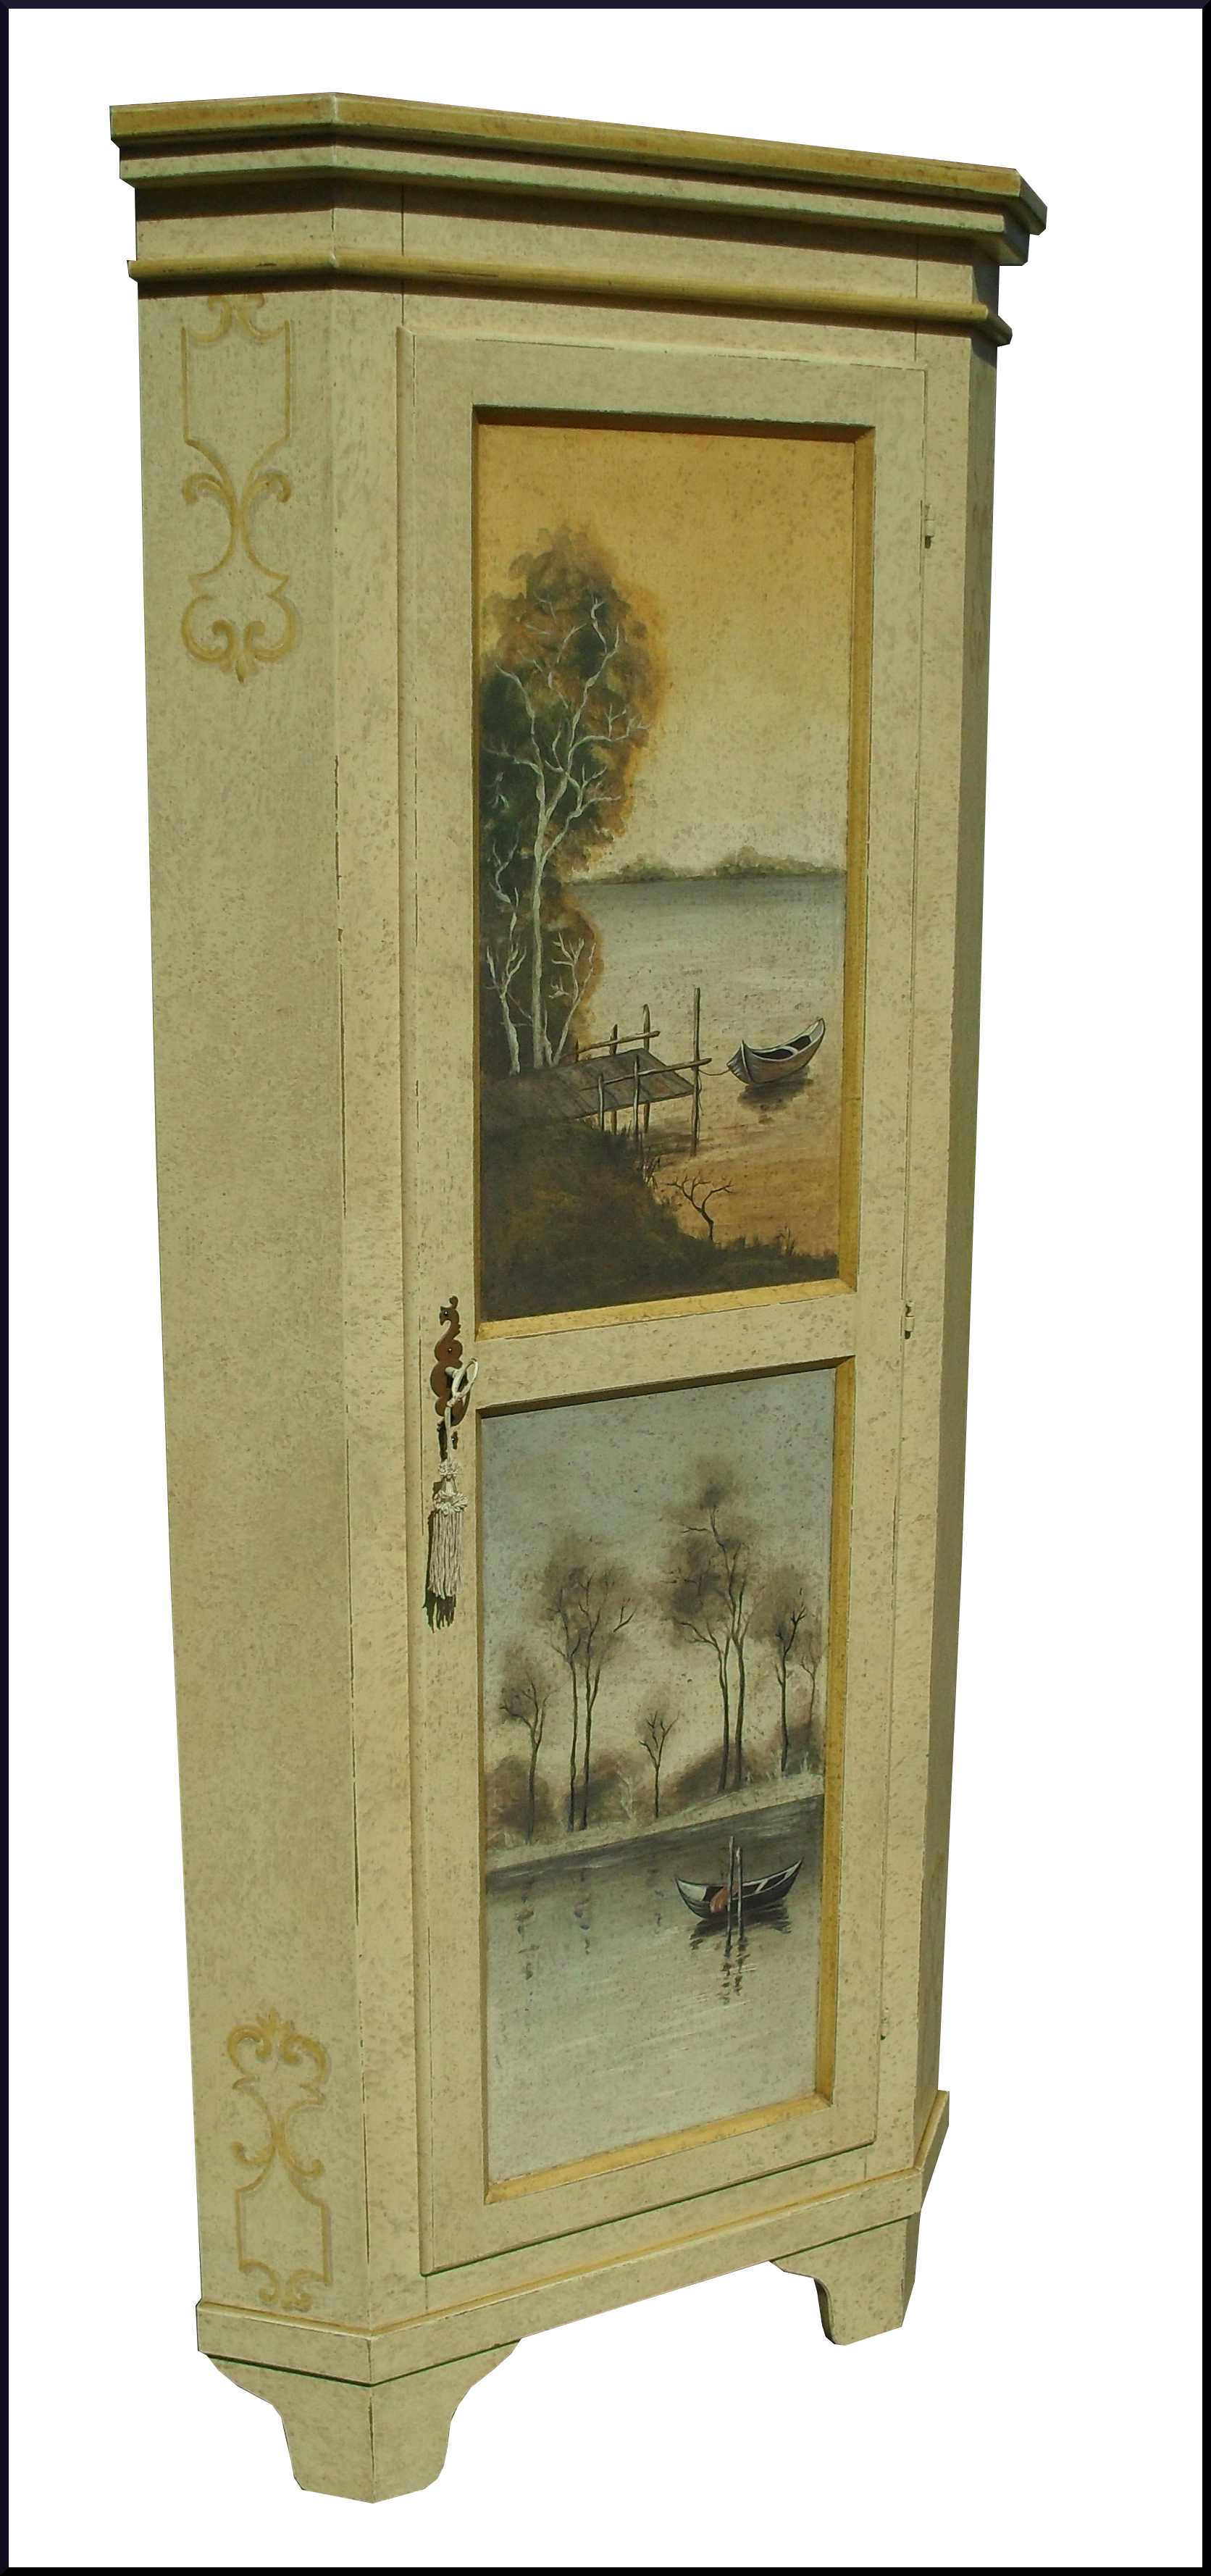 Angoliera cantonale dipinta a mano con paesaggi